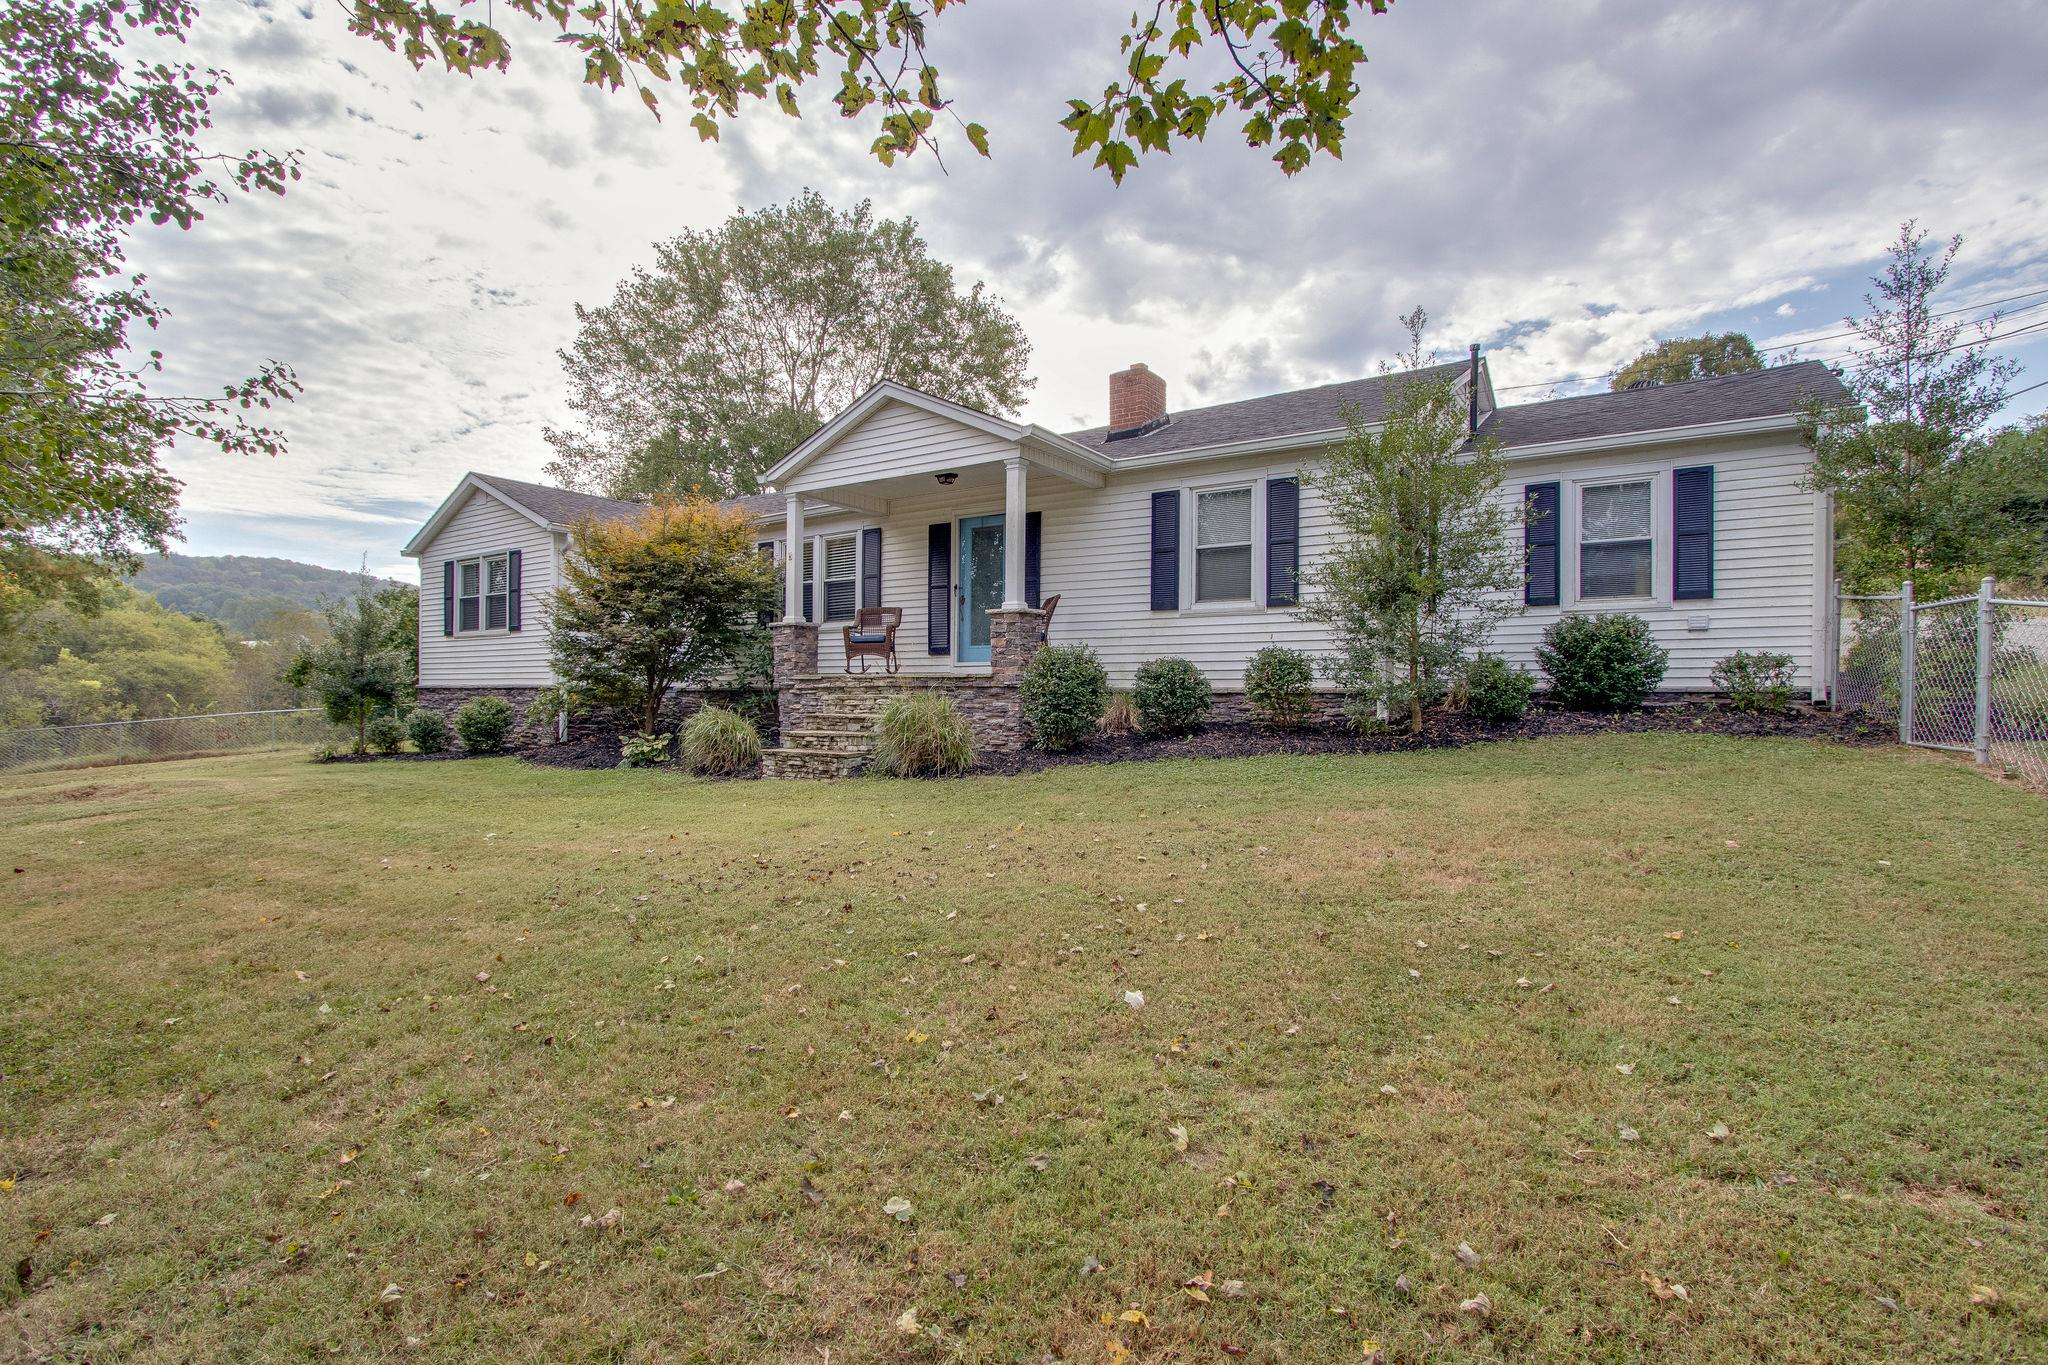 313 Lebanon Hwy, Carthage, TN 37030 - Carthage, TN real estate listing